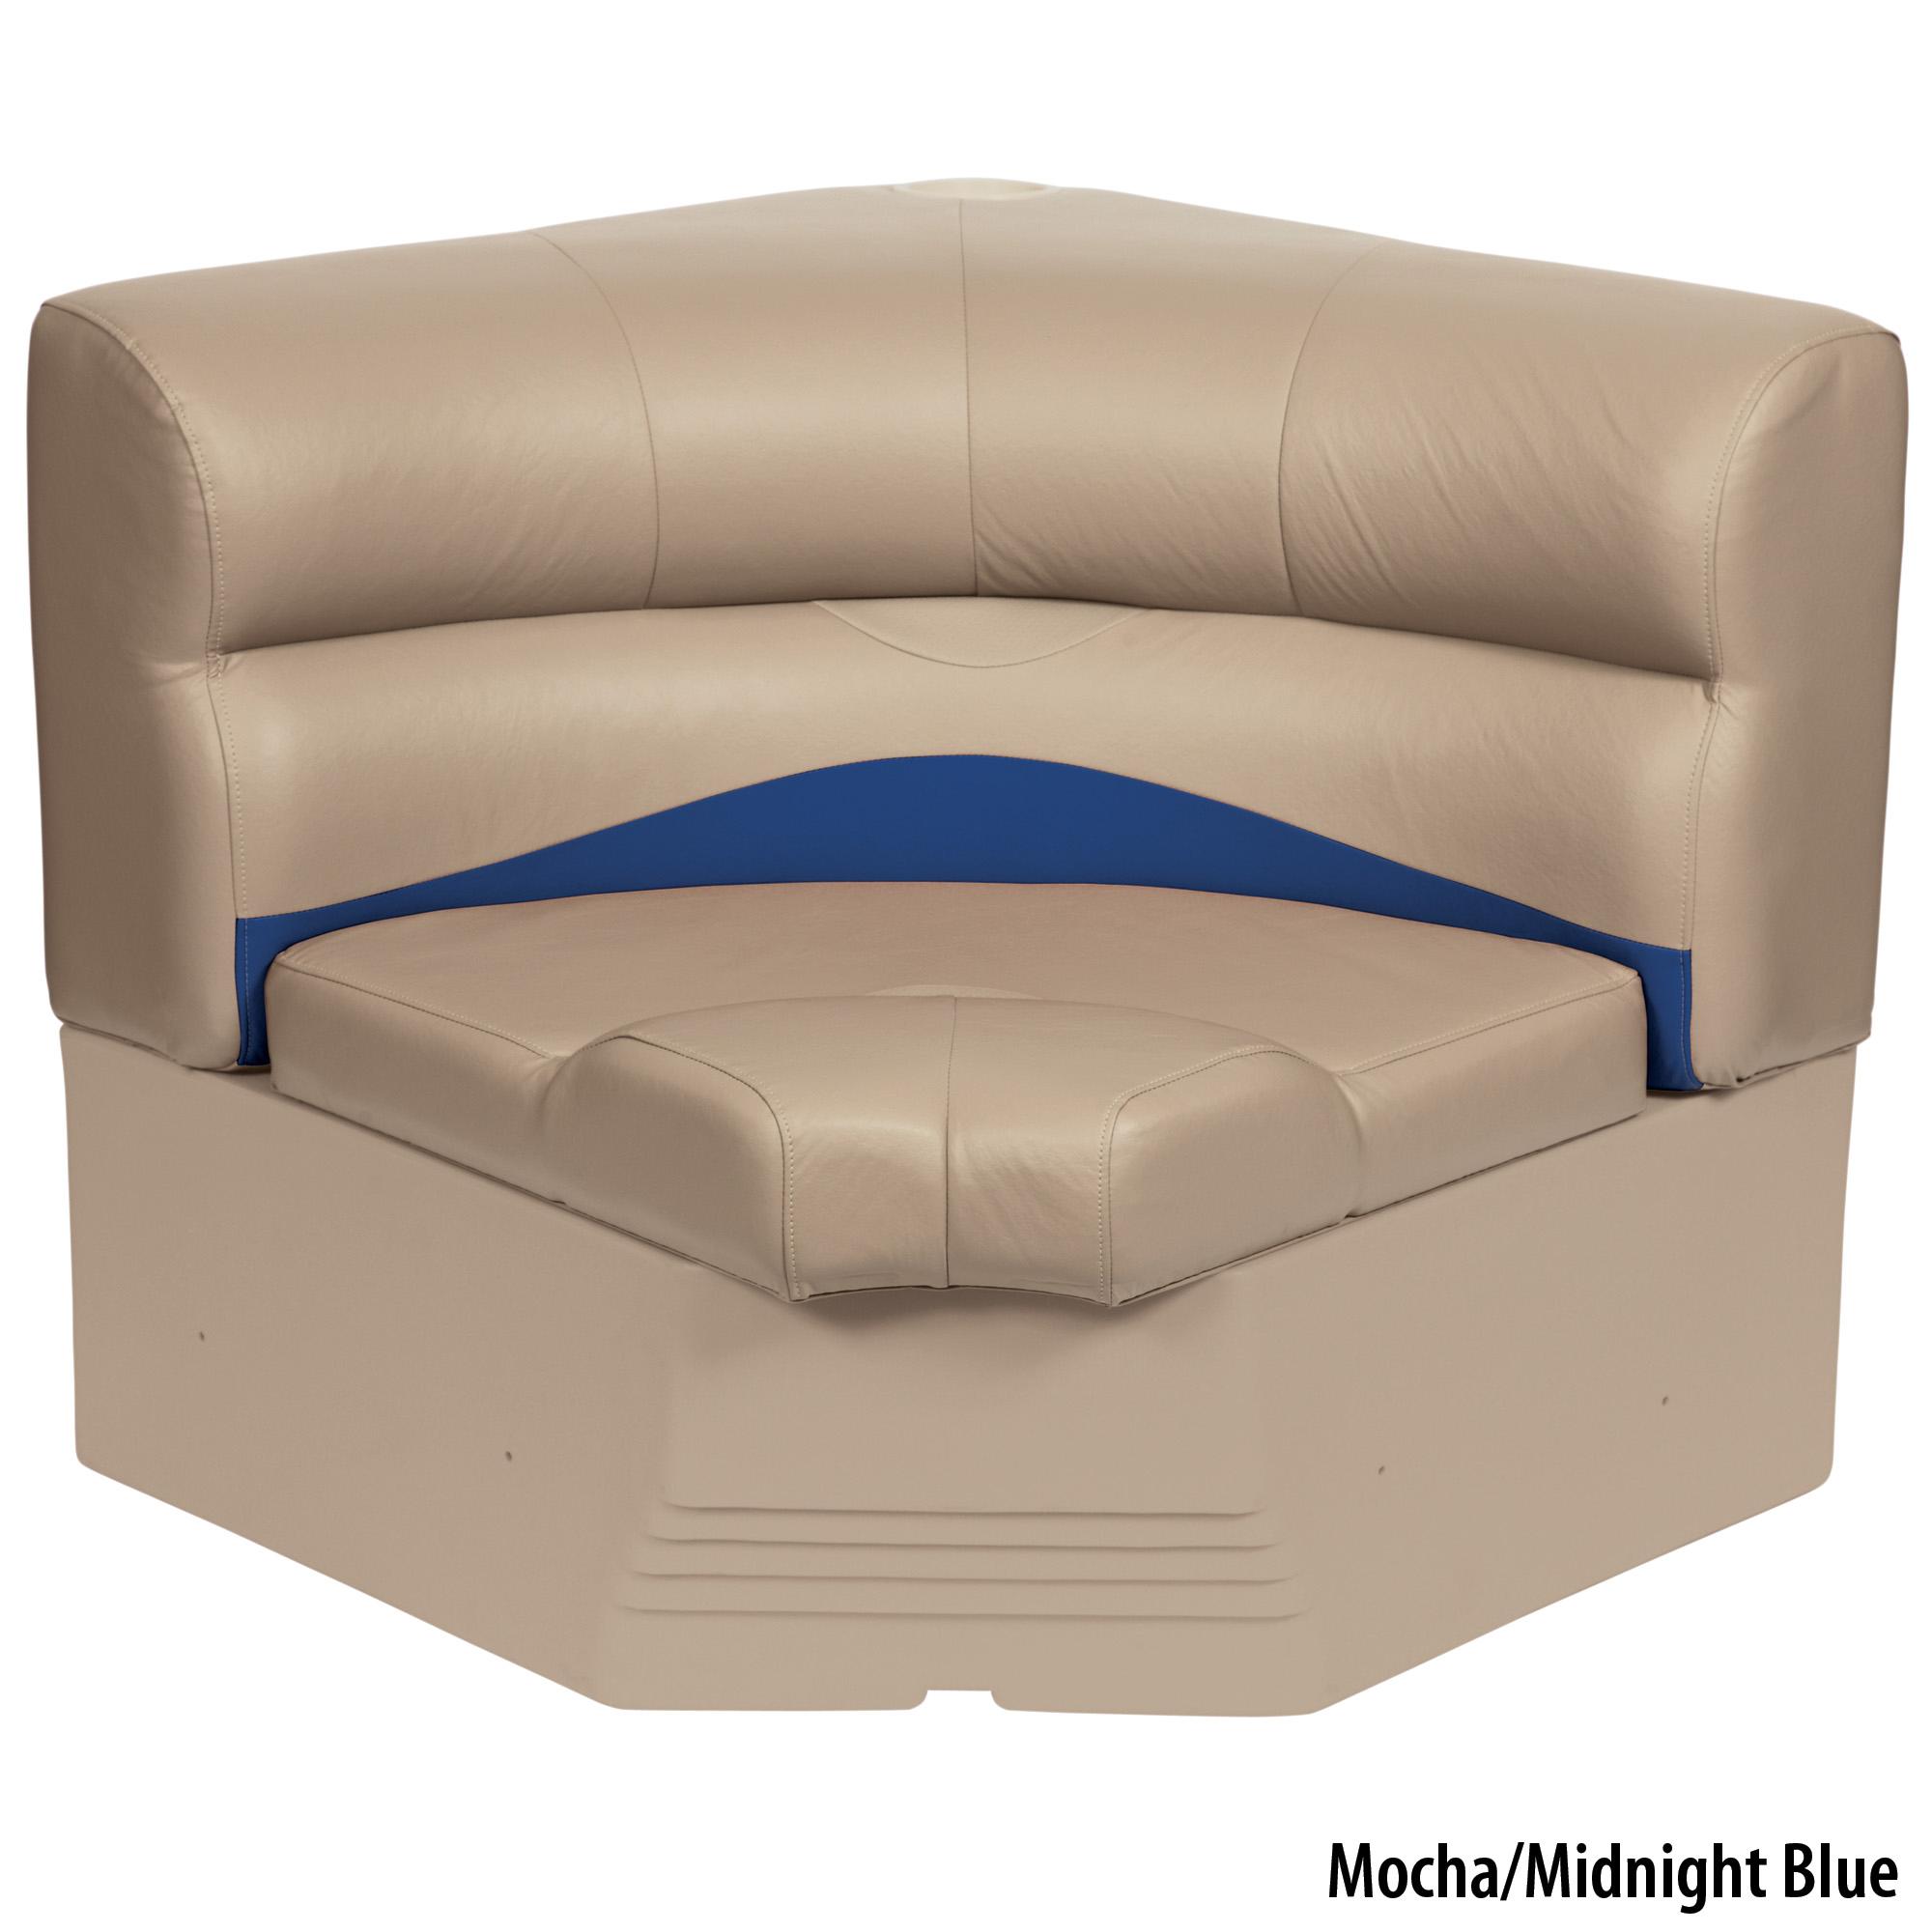 "Toonmate 32"" Premium Pontoon Corner Section Seat w/Rounded Corner, Mocha Base"